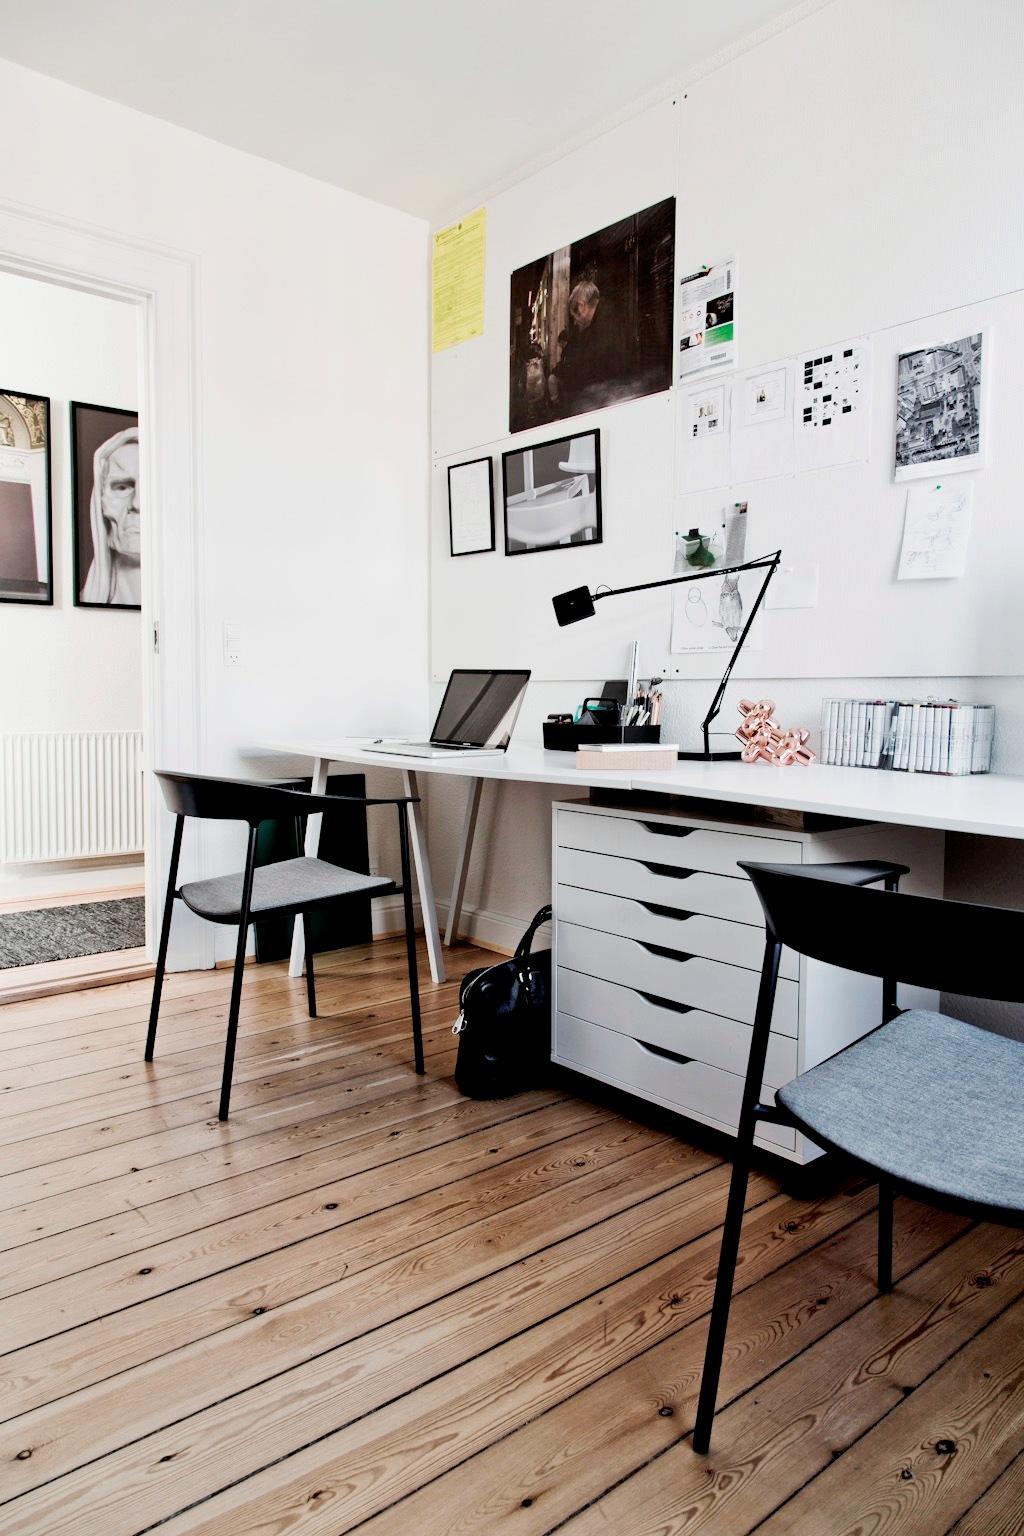 Lerche design   spisebordsstole, barstole og skamler